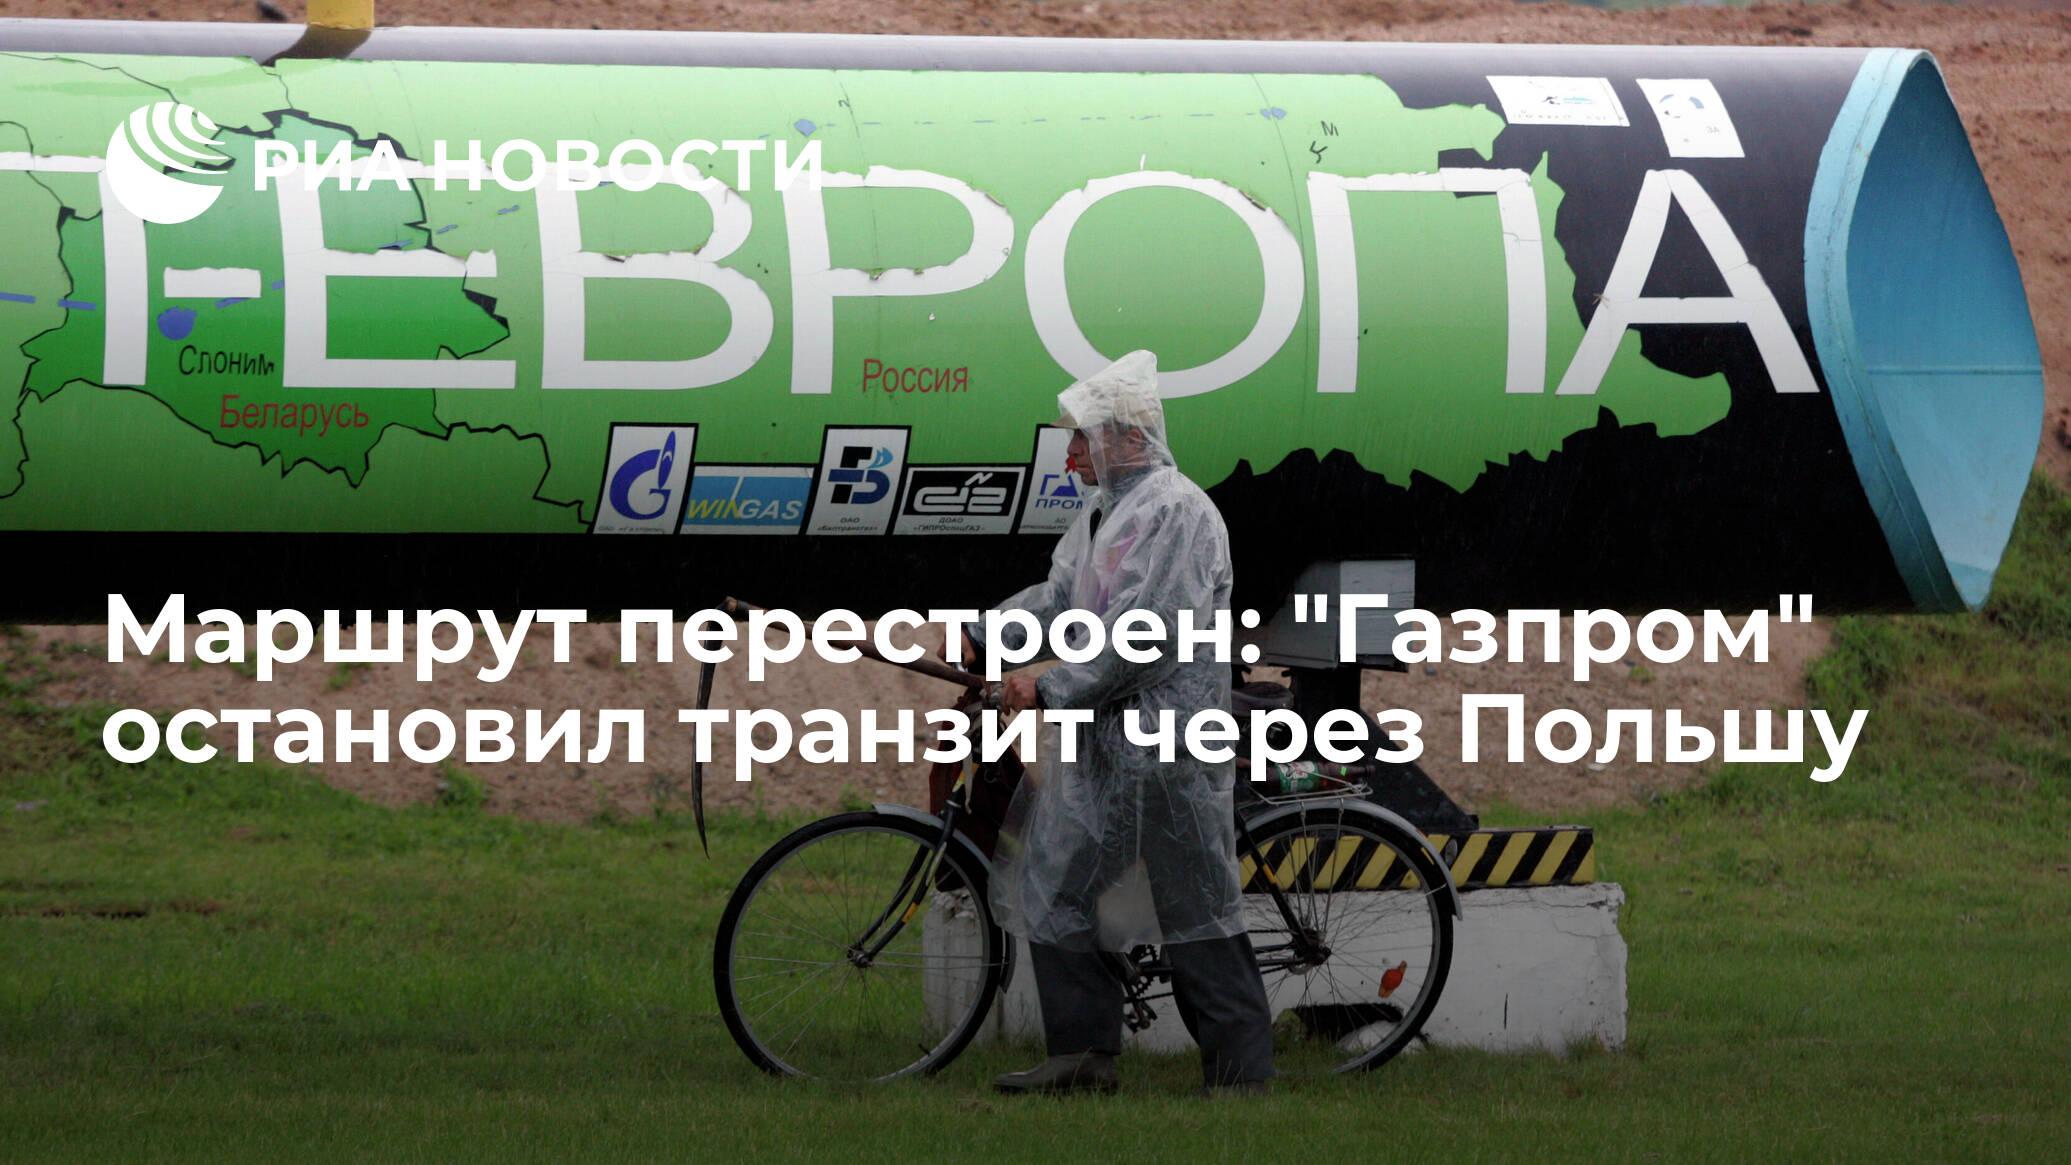 Маршрут перестроен: 'Газпром' остановил транзит через Польшу - РИА НОВОСТИ